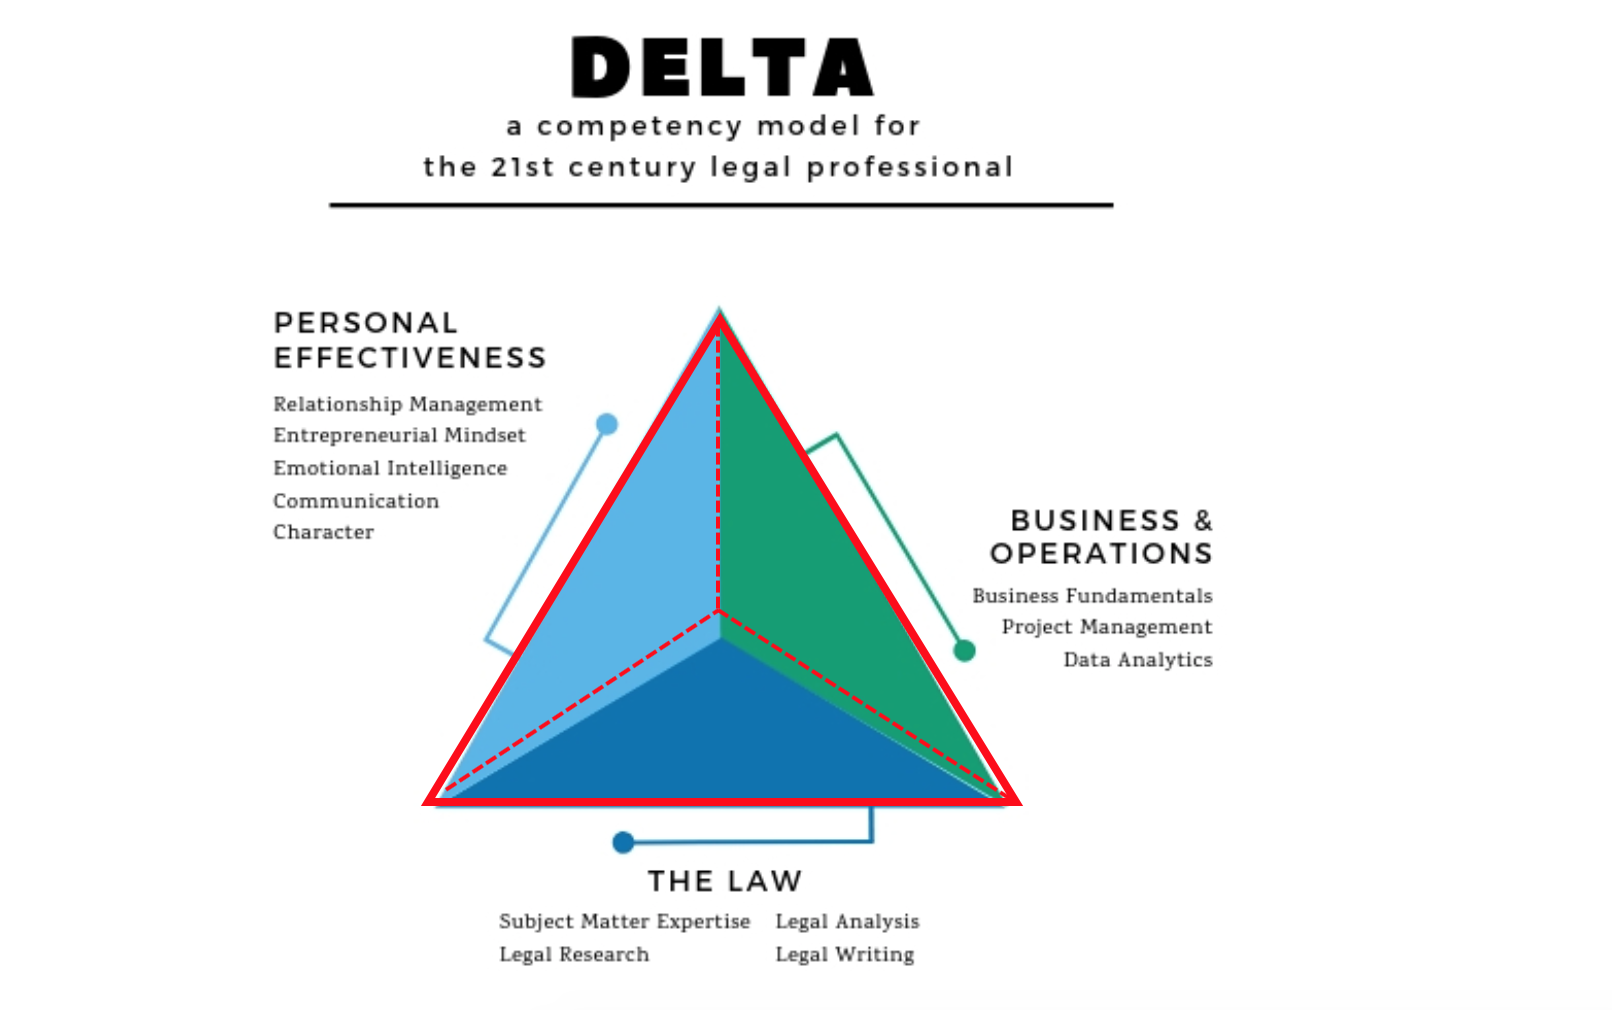 DeltaModelContext